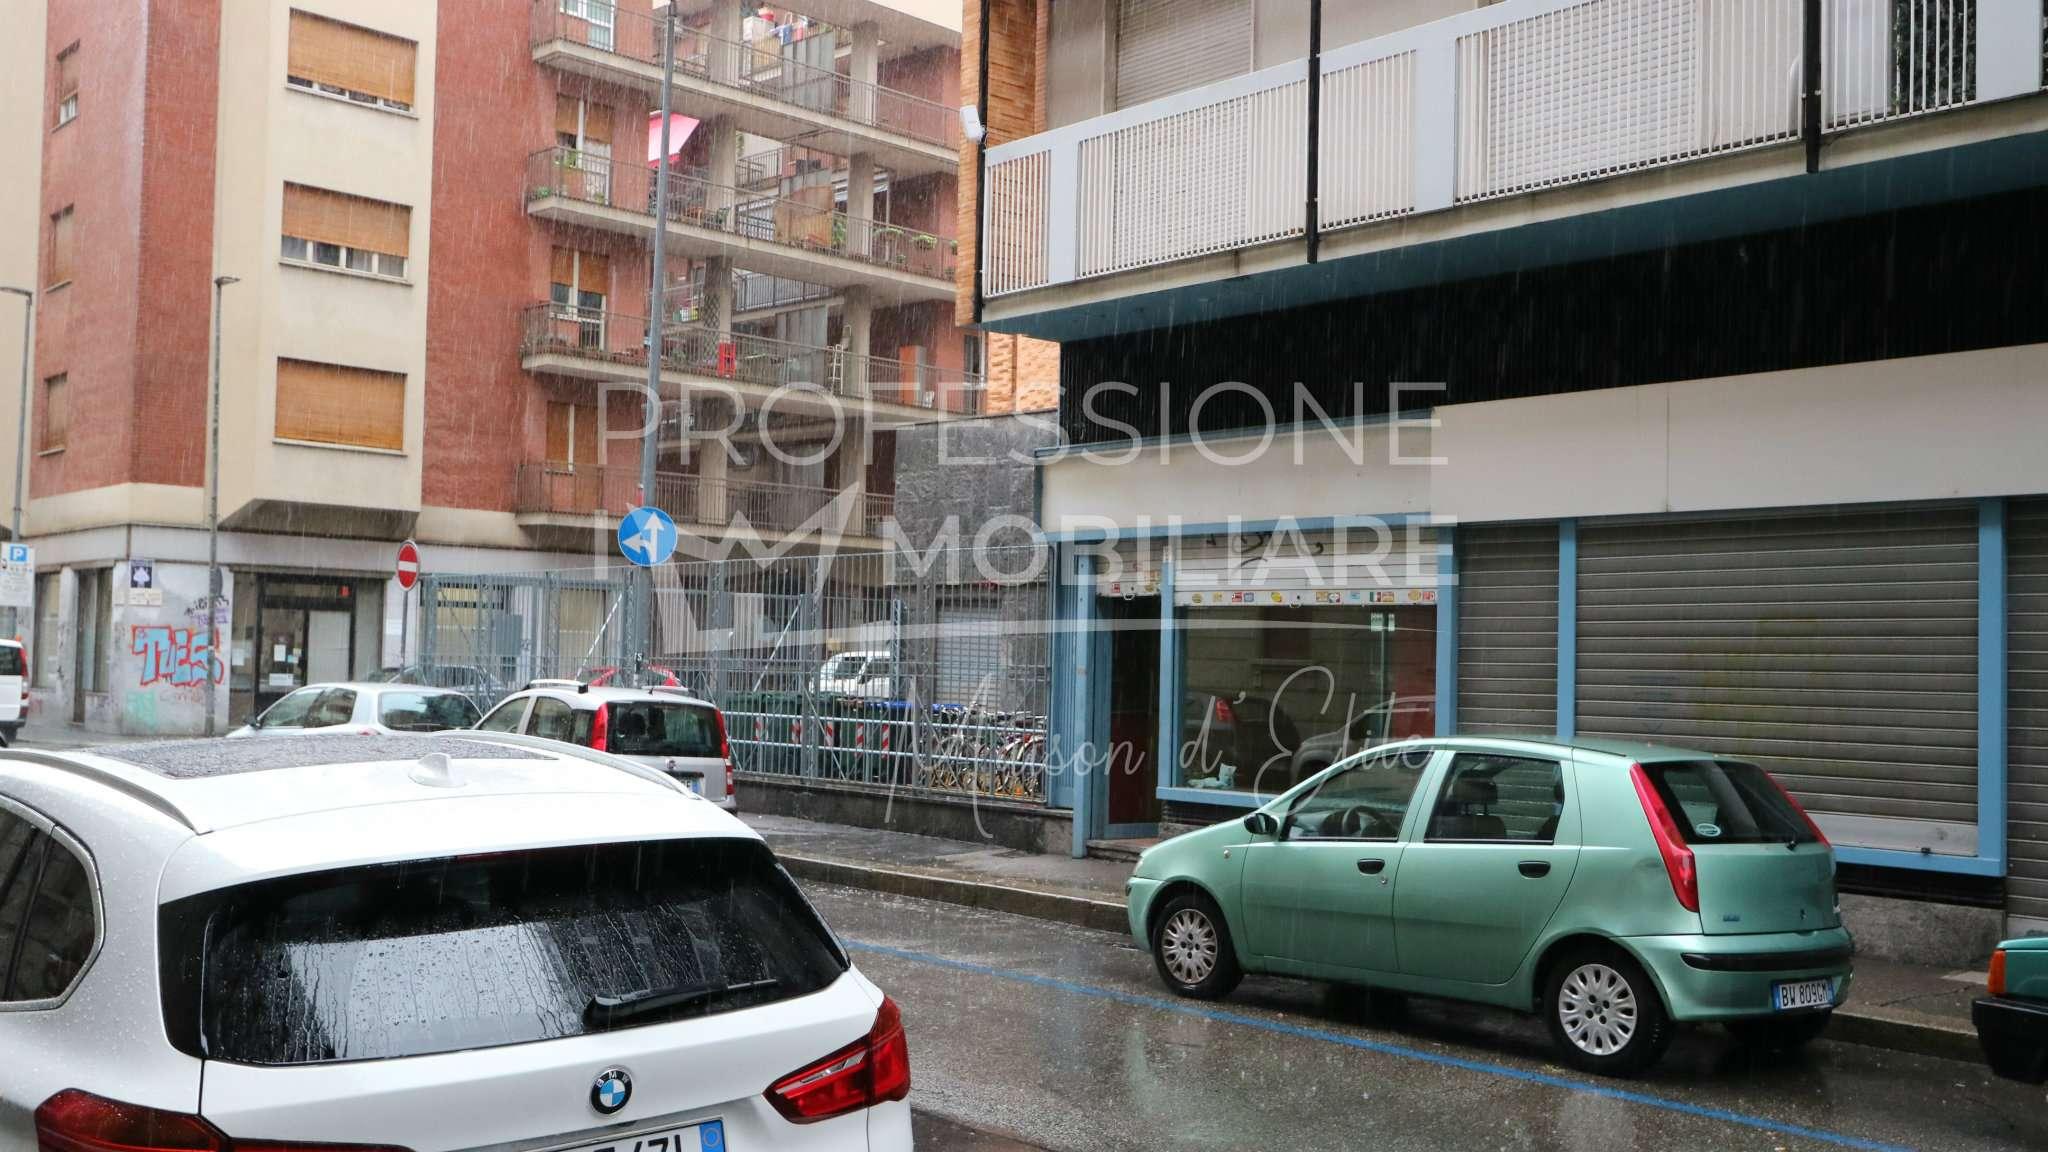 Negozio in vendita Zona San Salvario - via Giotto 10 Torino